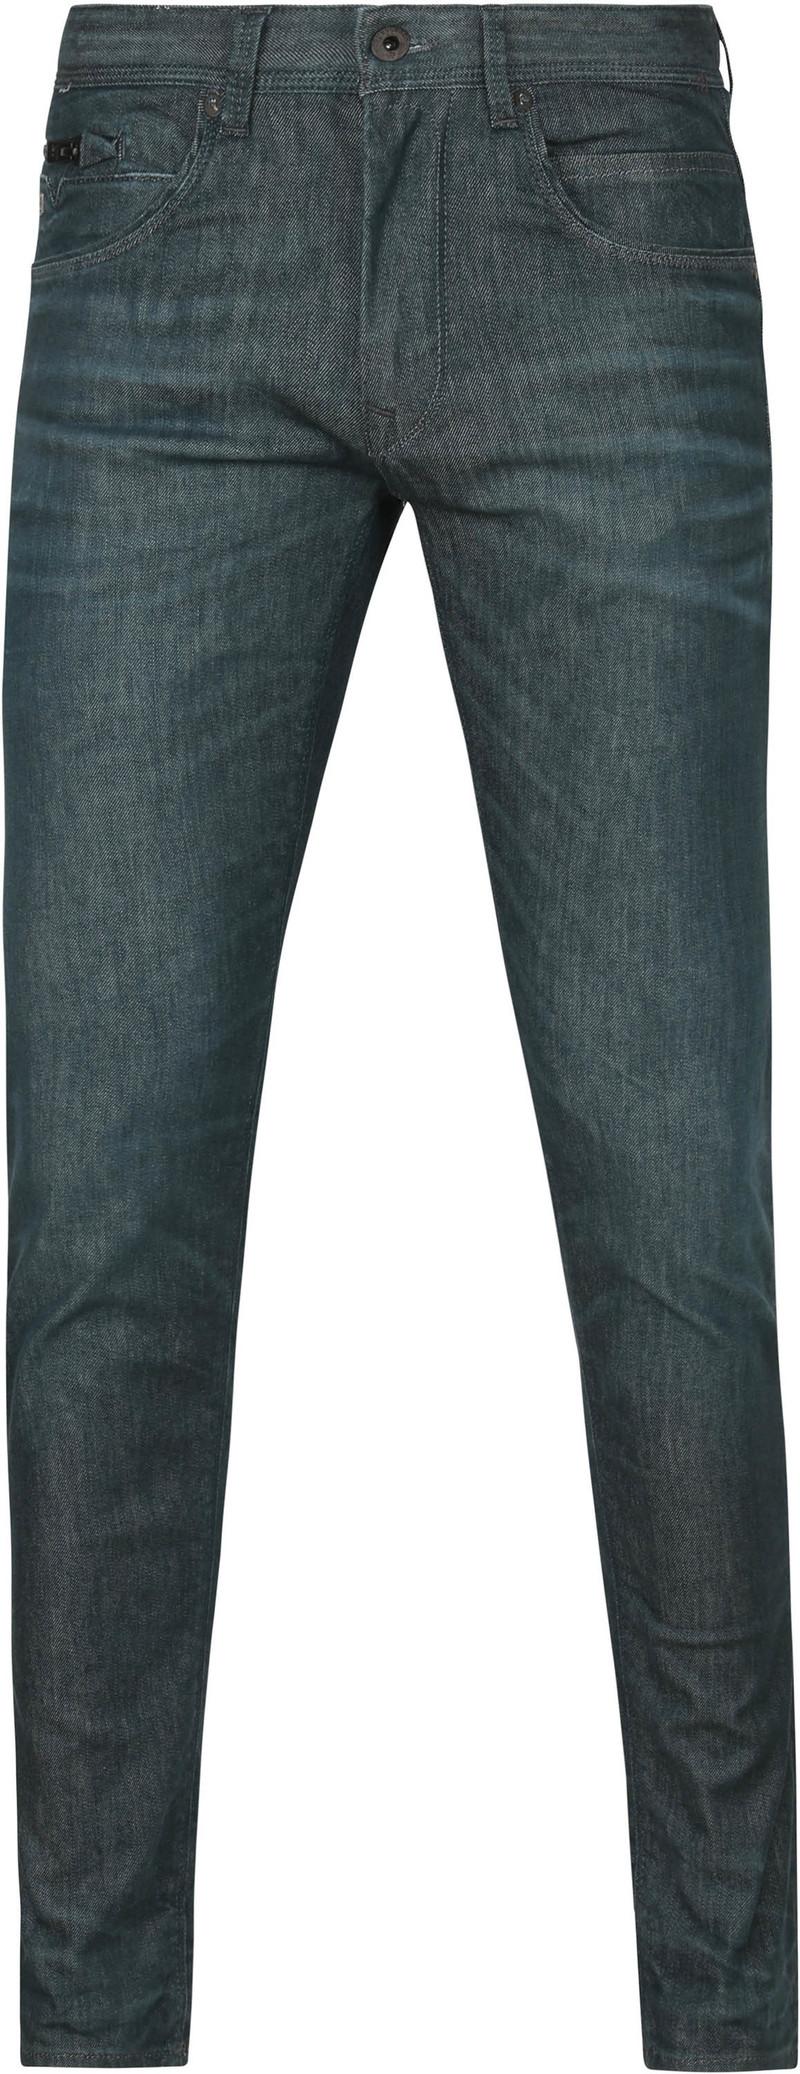 Vanguard V850 Rider Jeans Groen